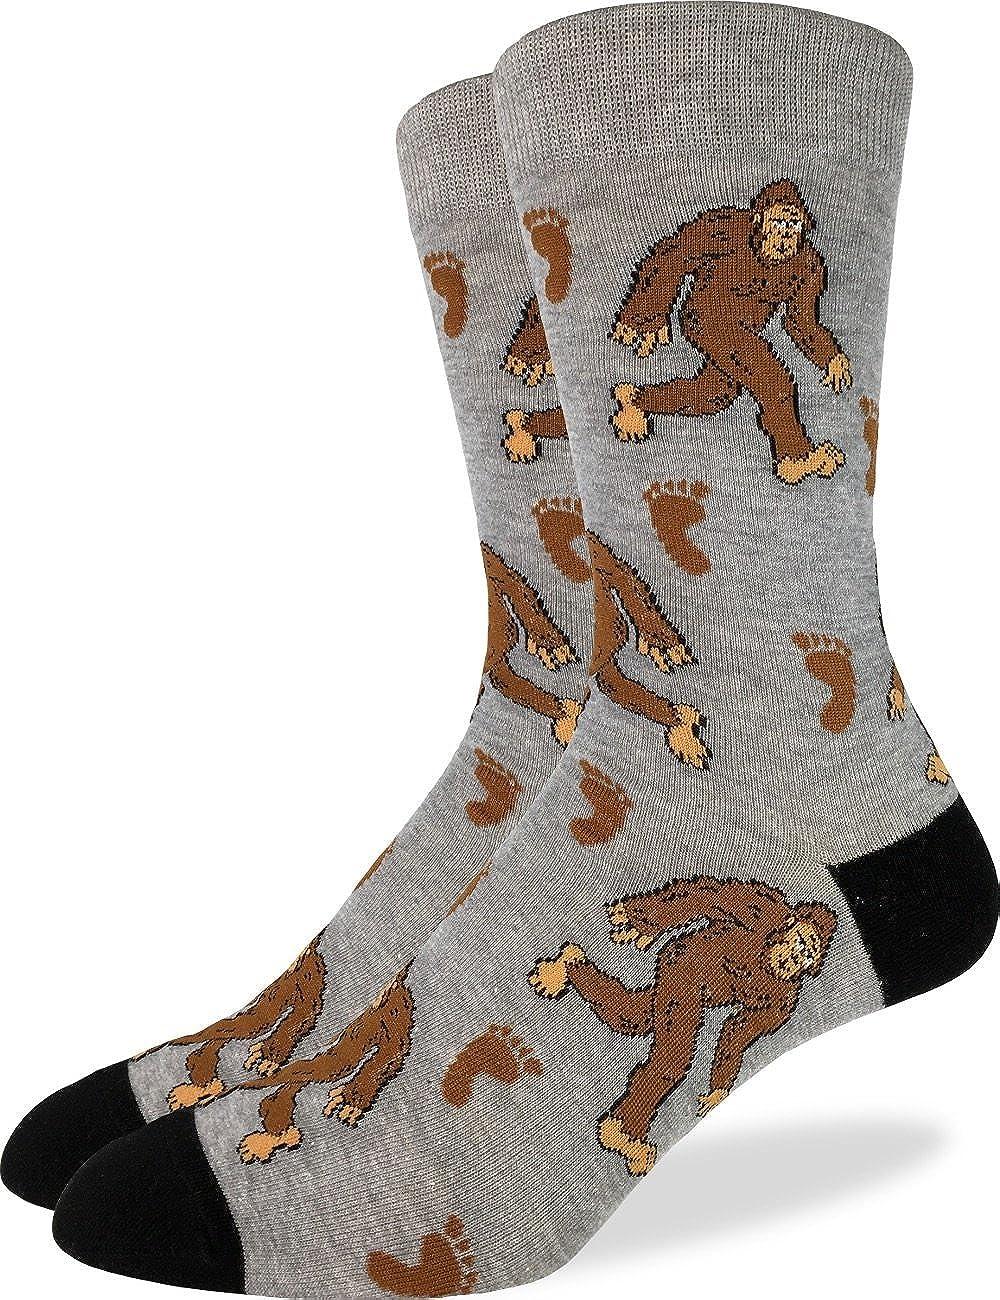 Good Luck Sock Men's Extra Large Bigfoot Socks - Shoe Size 13-17, Big & Tall